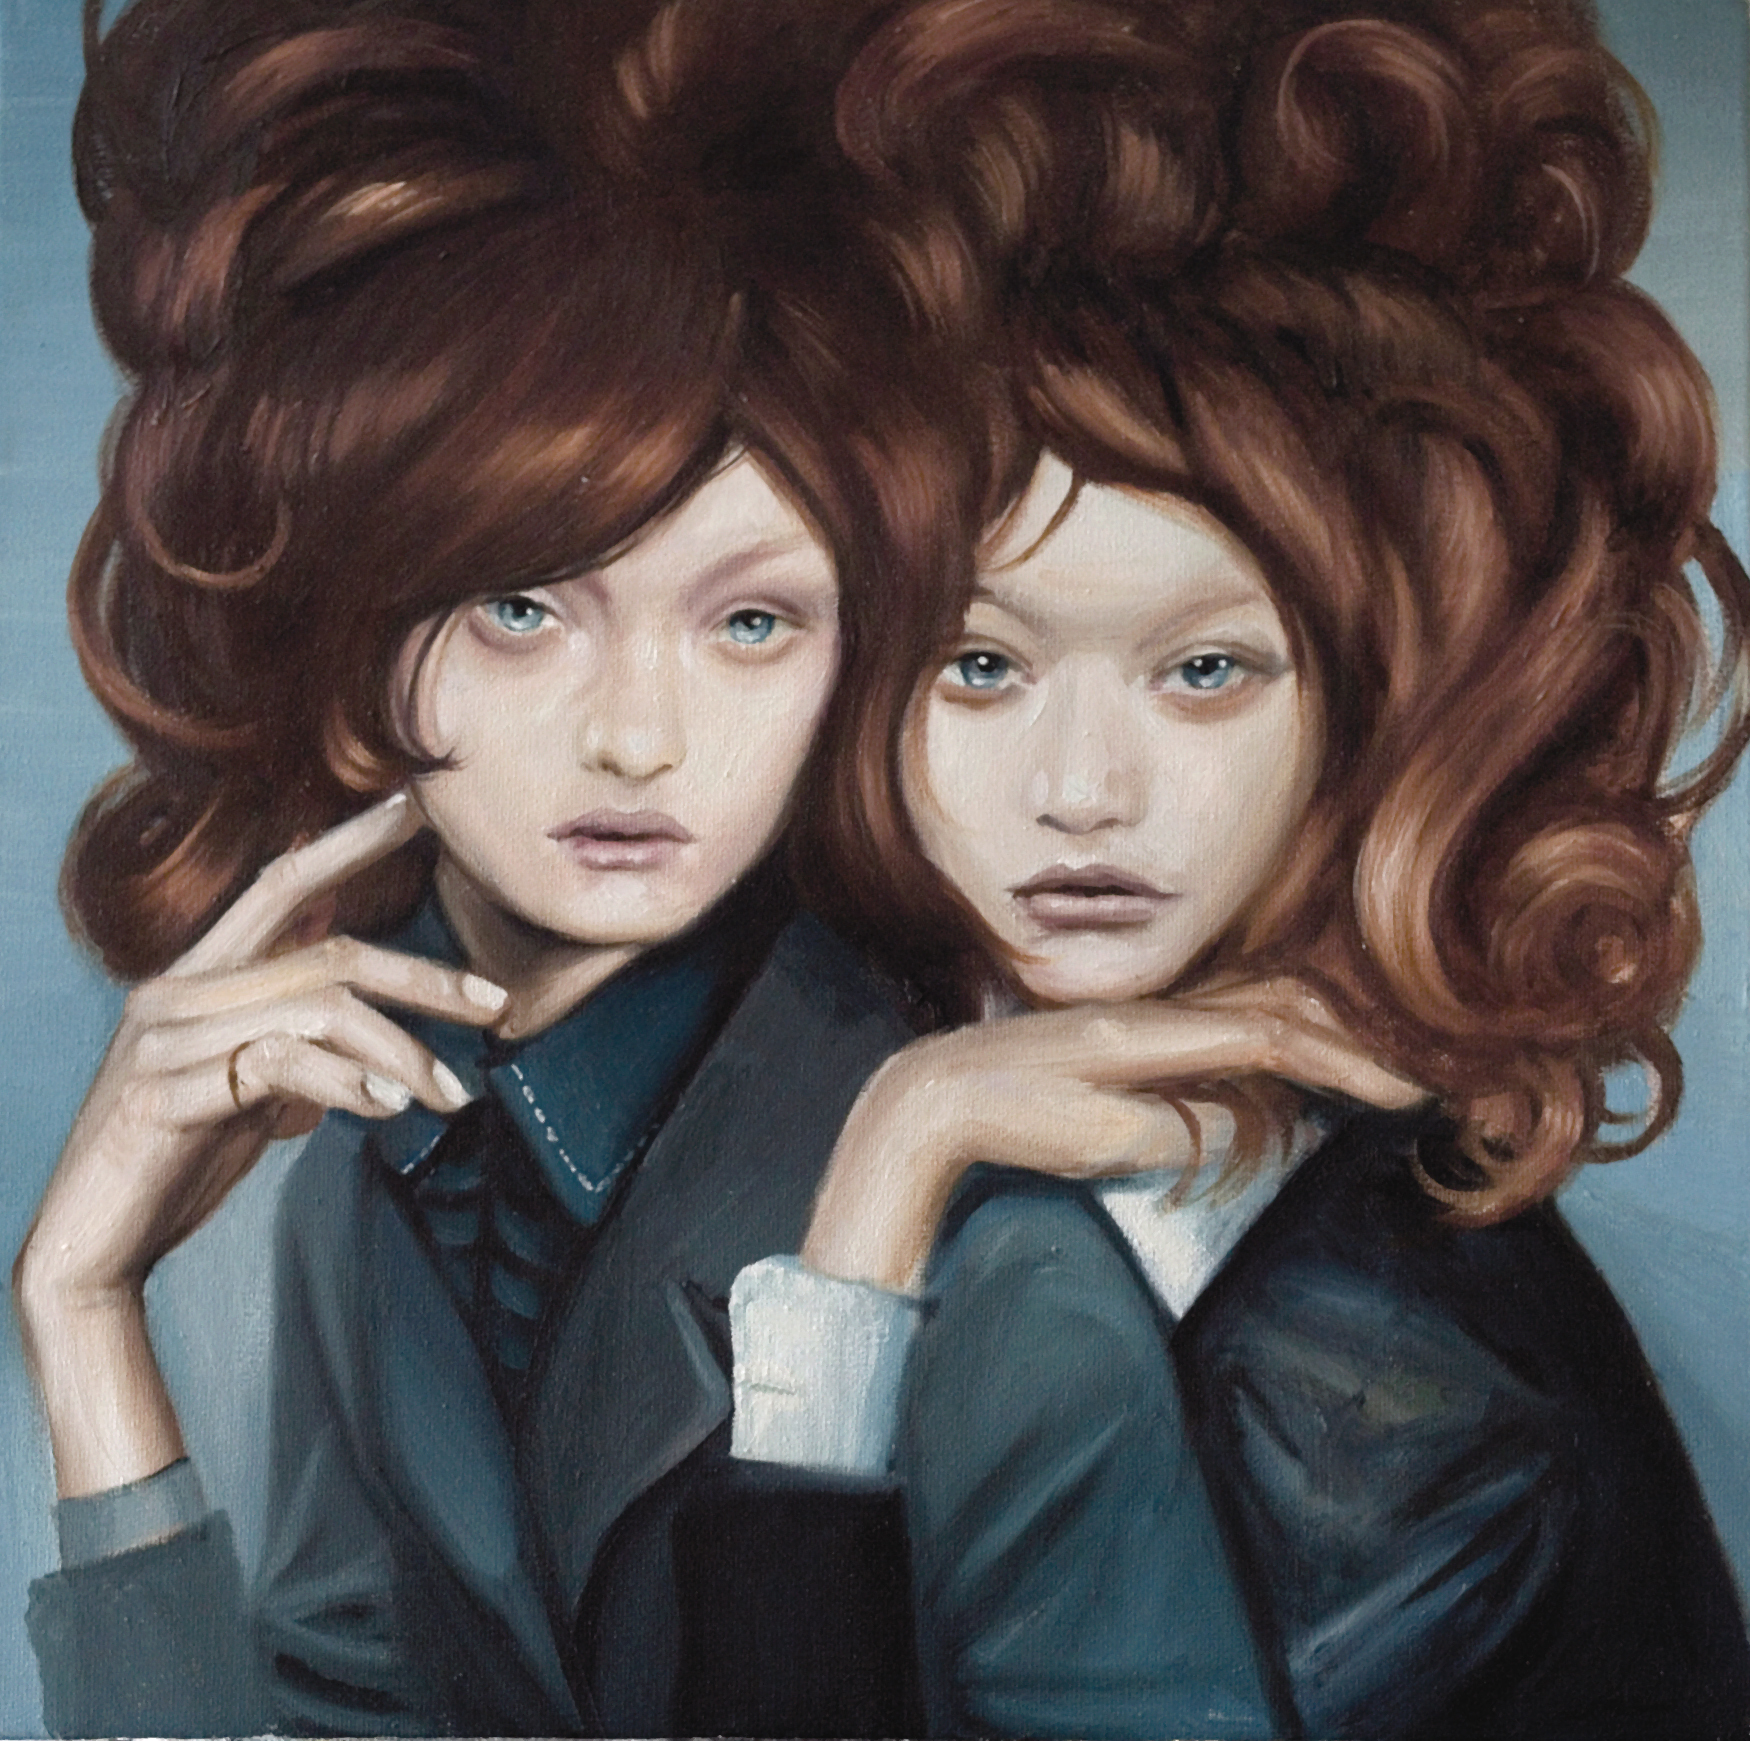 'Twins'